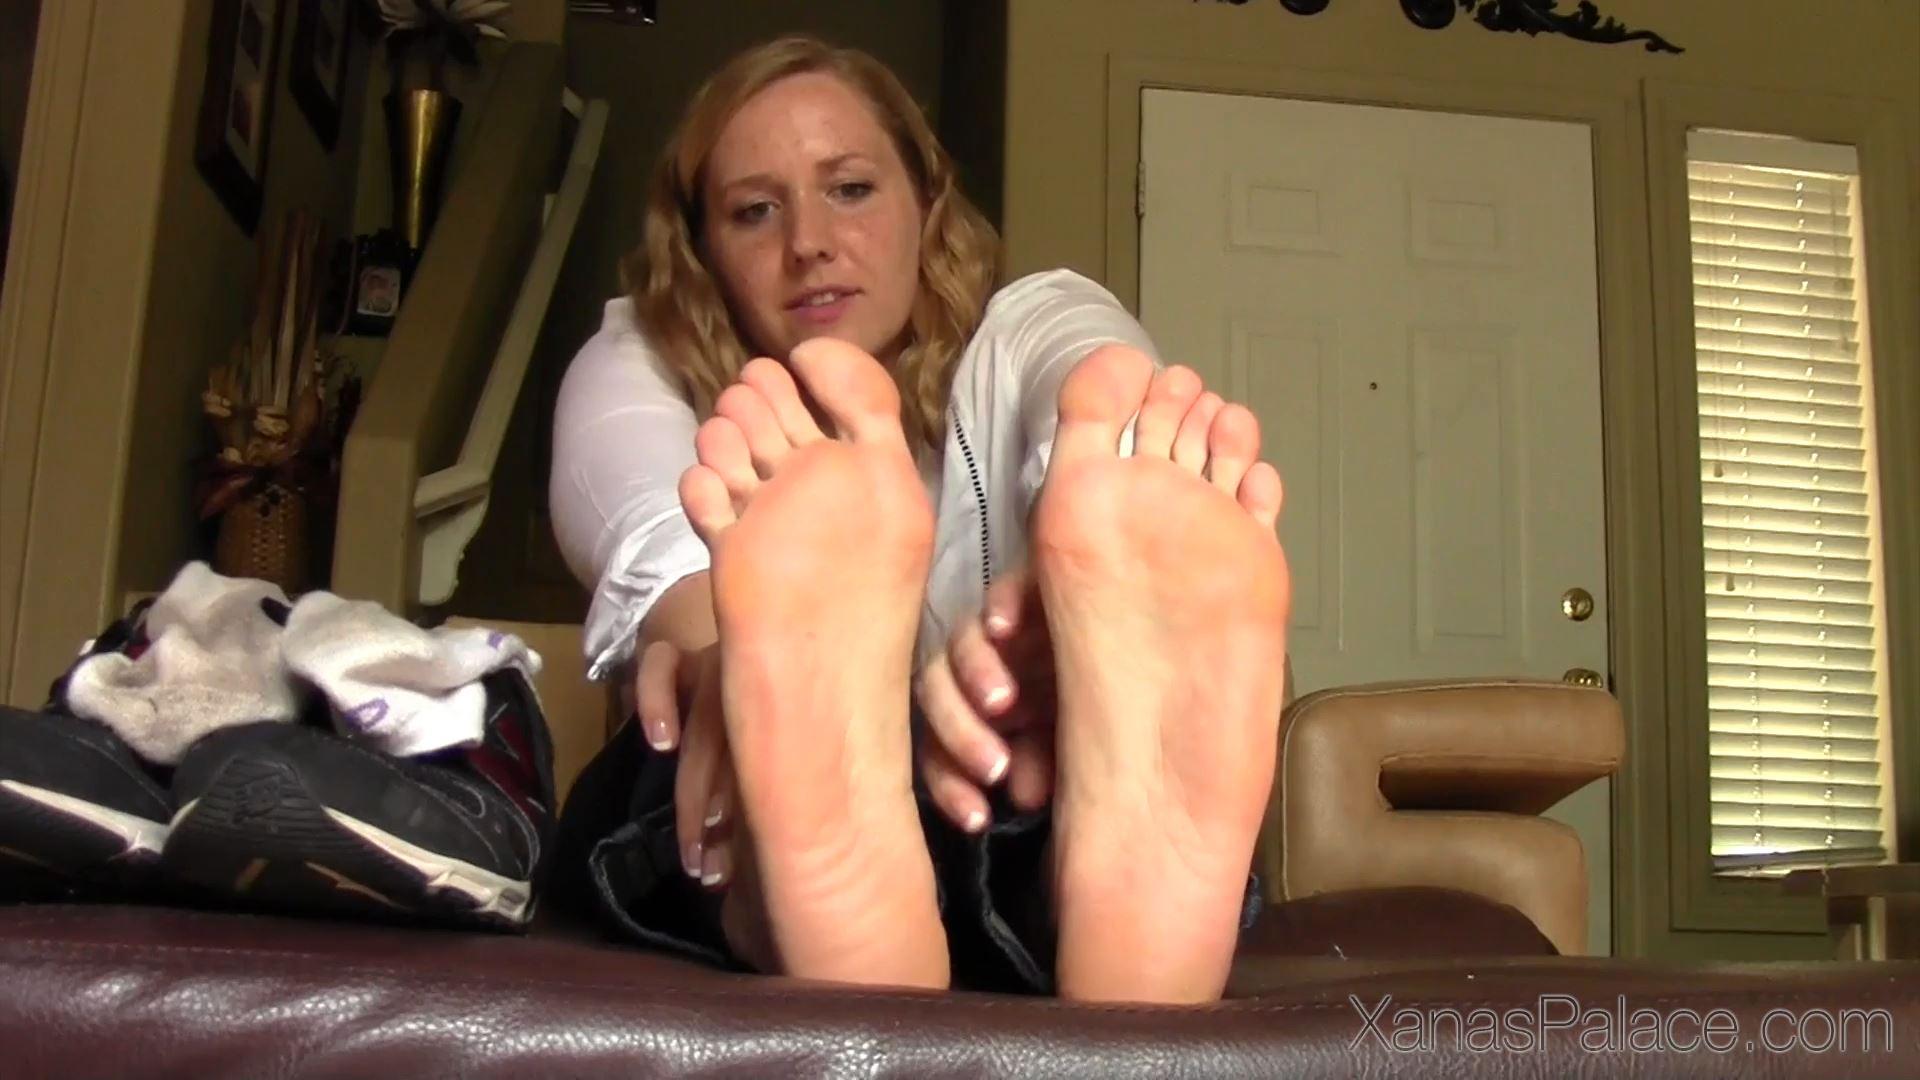 Michelle In Scene: Michelle's Hot Sweaty Athletic Feet - XANASPALACE - FULL HD/1080p/MP4